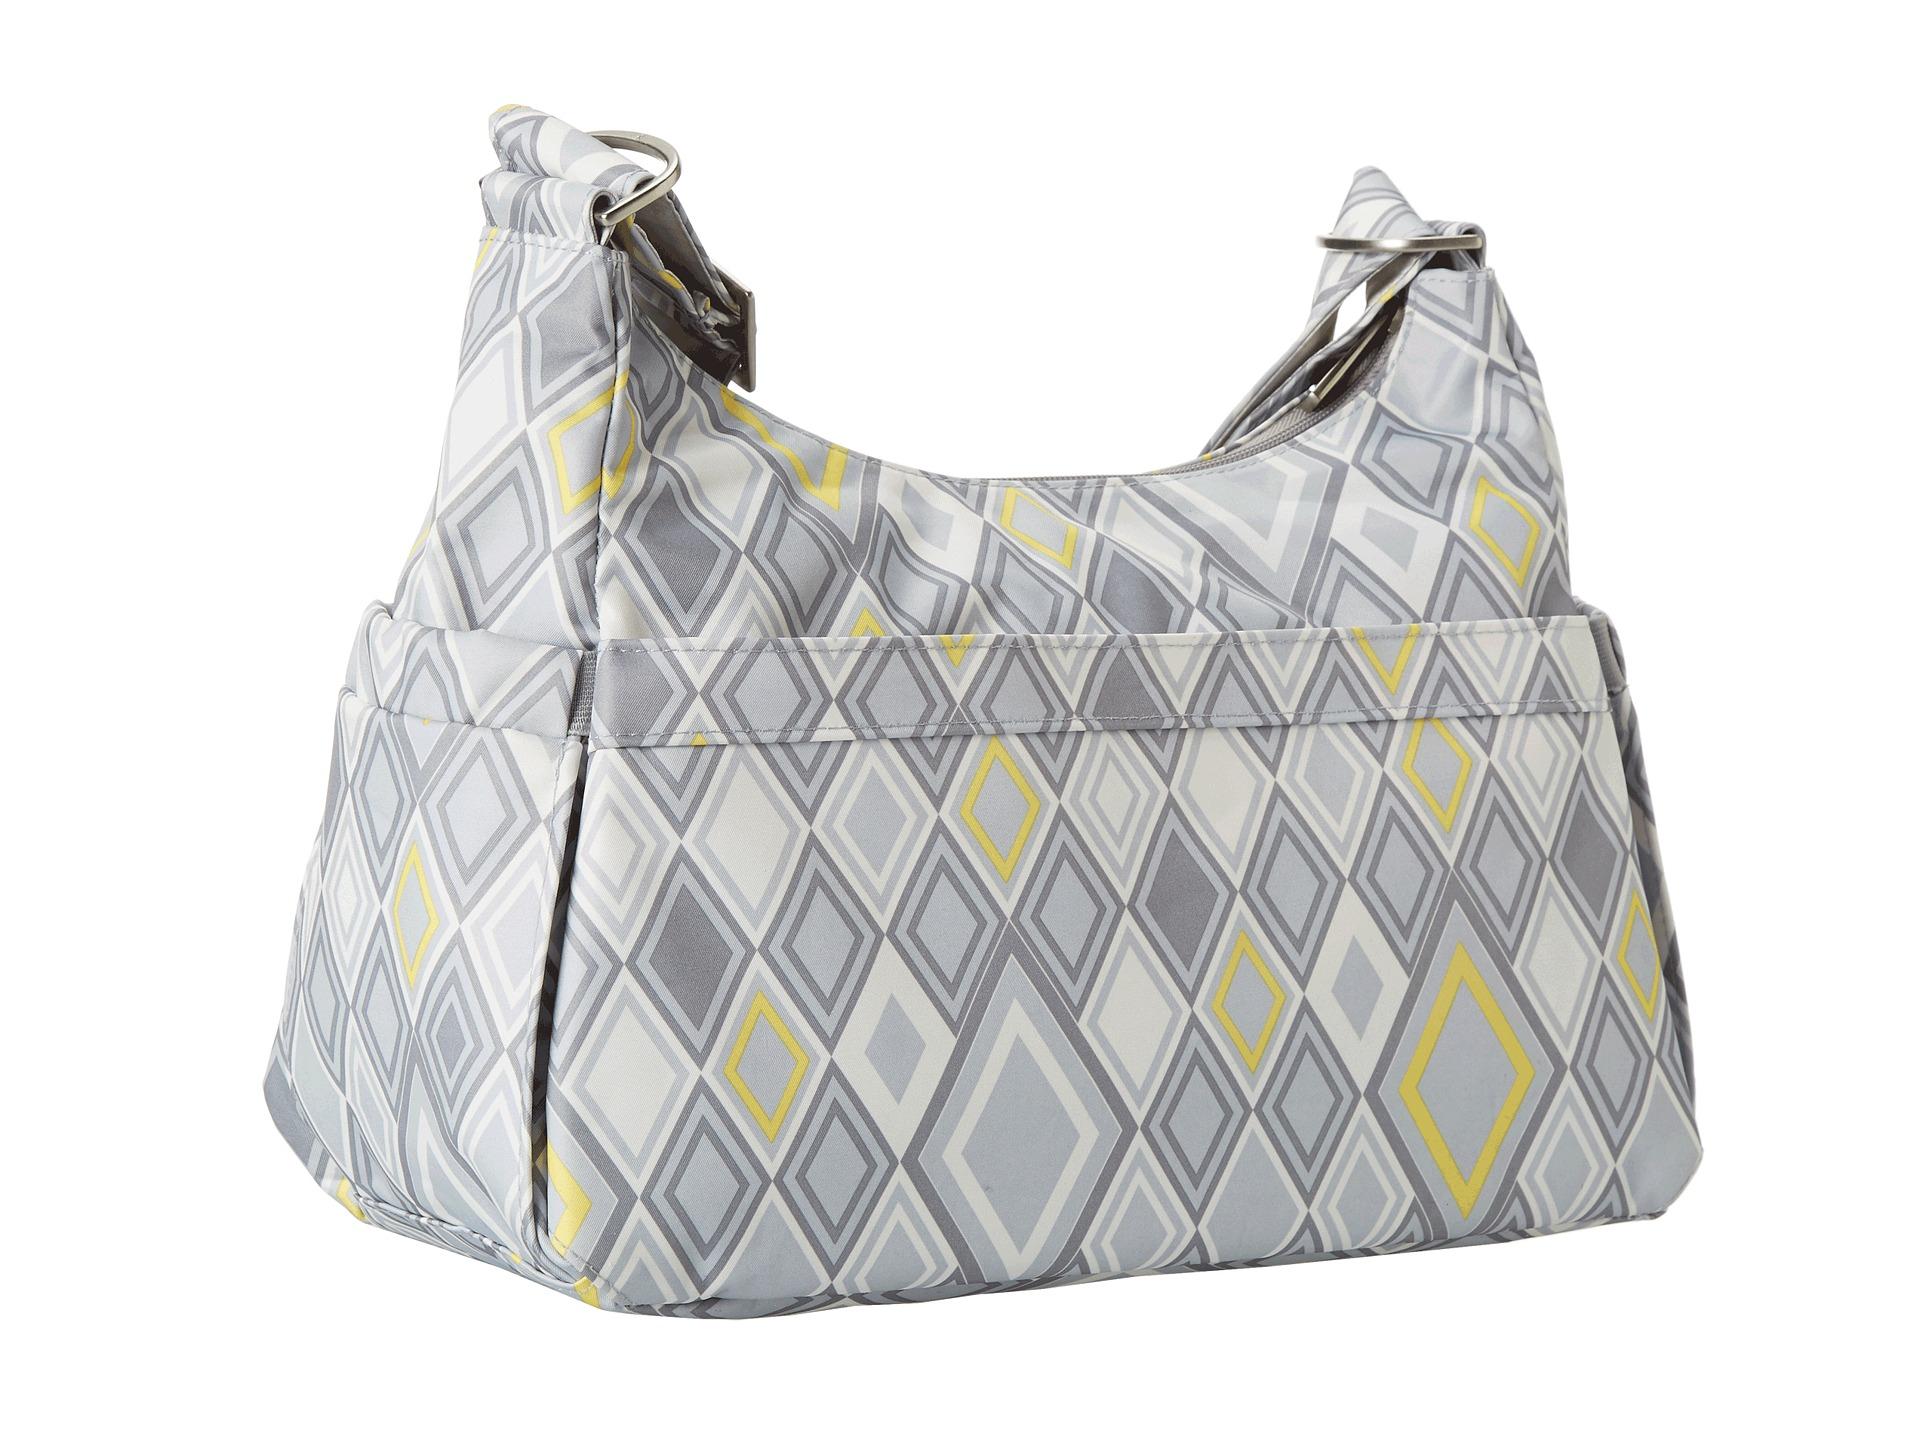 ju ju be hobo be messenger diaper bag with insulated bottle pockets and 4 zippered pockets. Black Bedroom Furniture Sets. Home Design Ideas